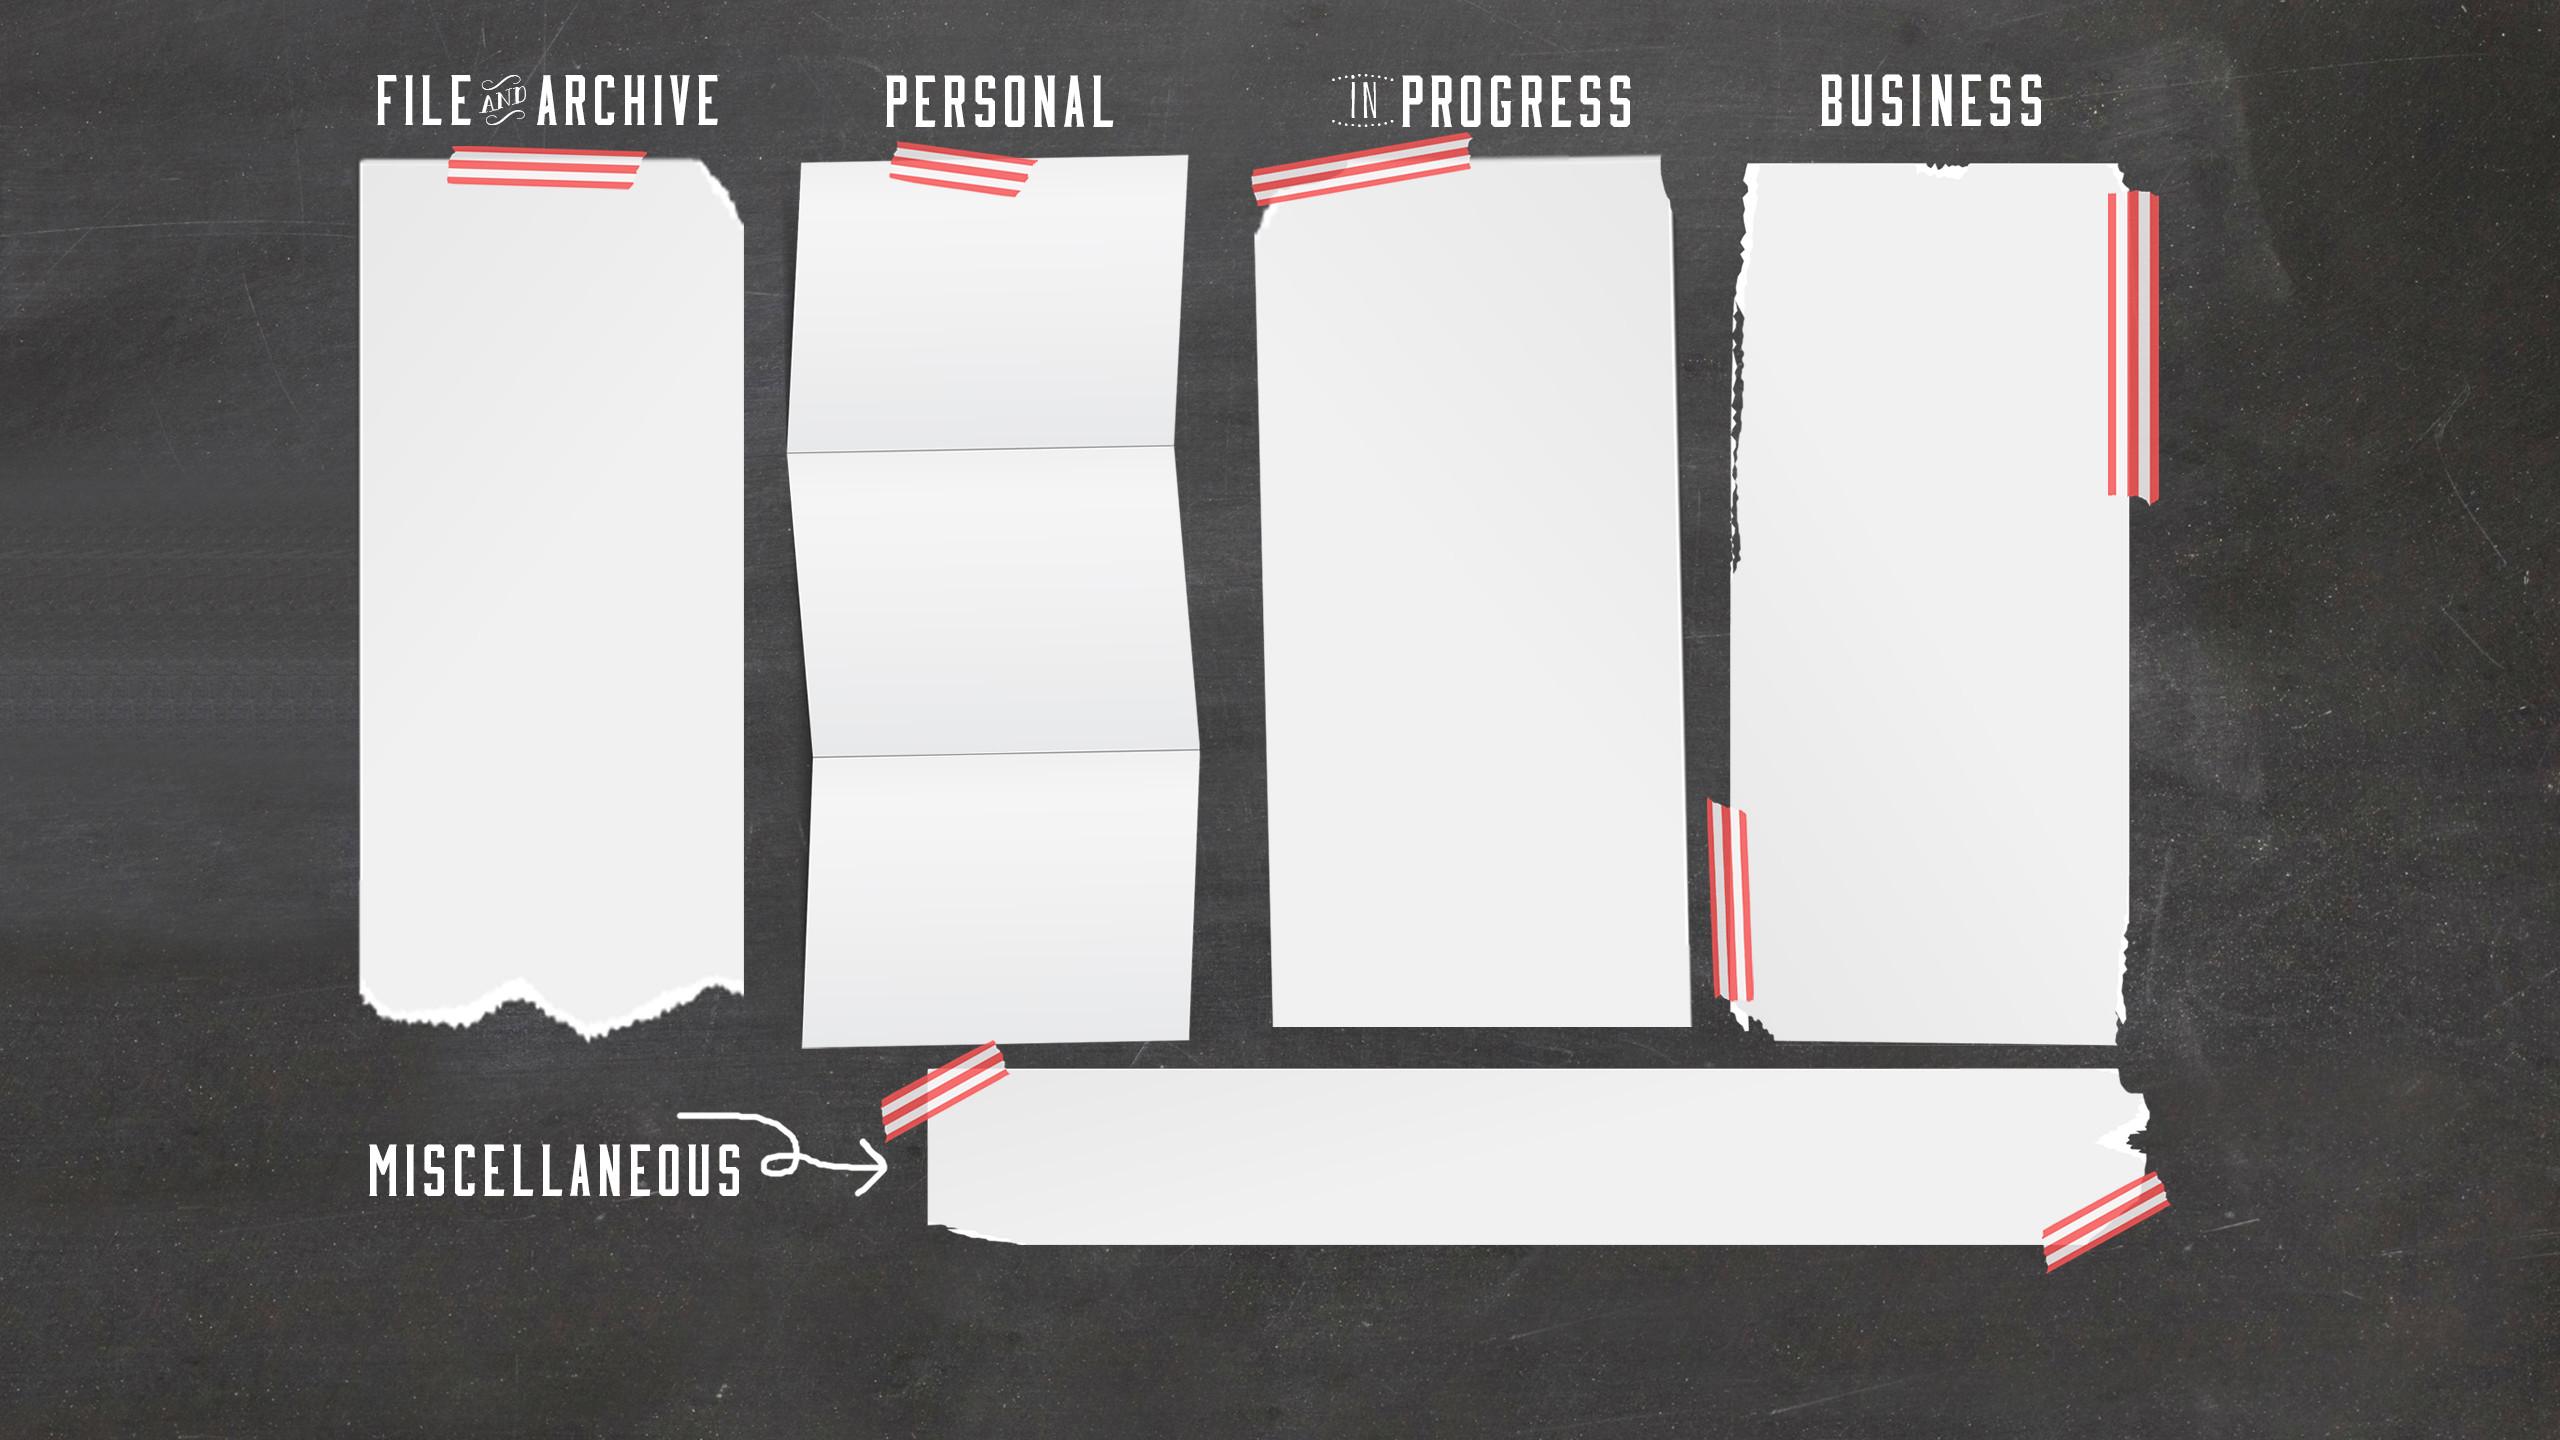 2560x1440 desktop icon organizer wallpaper -#main